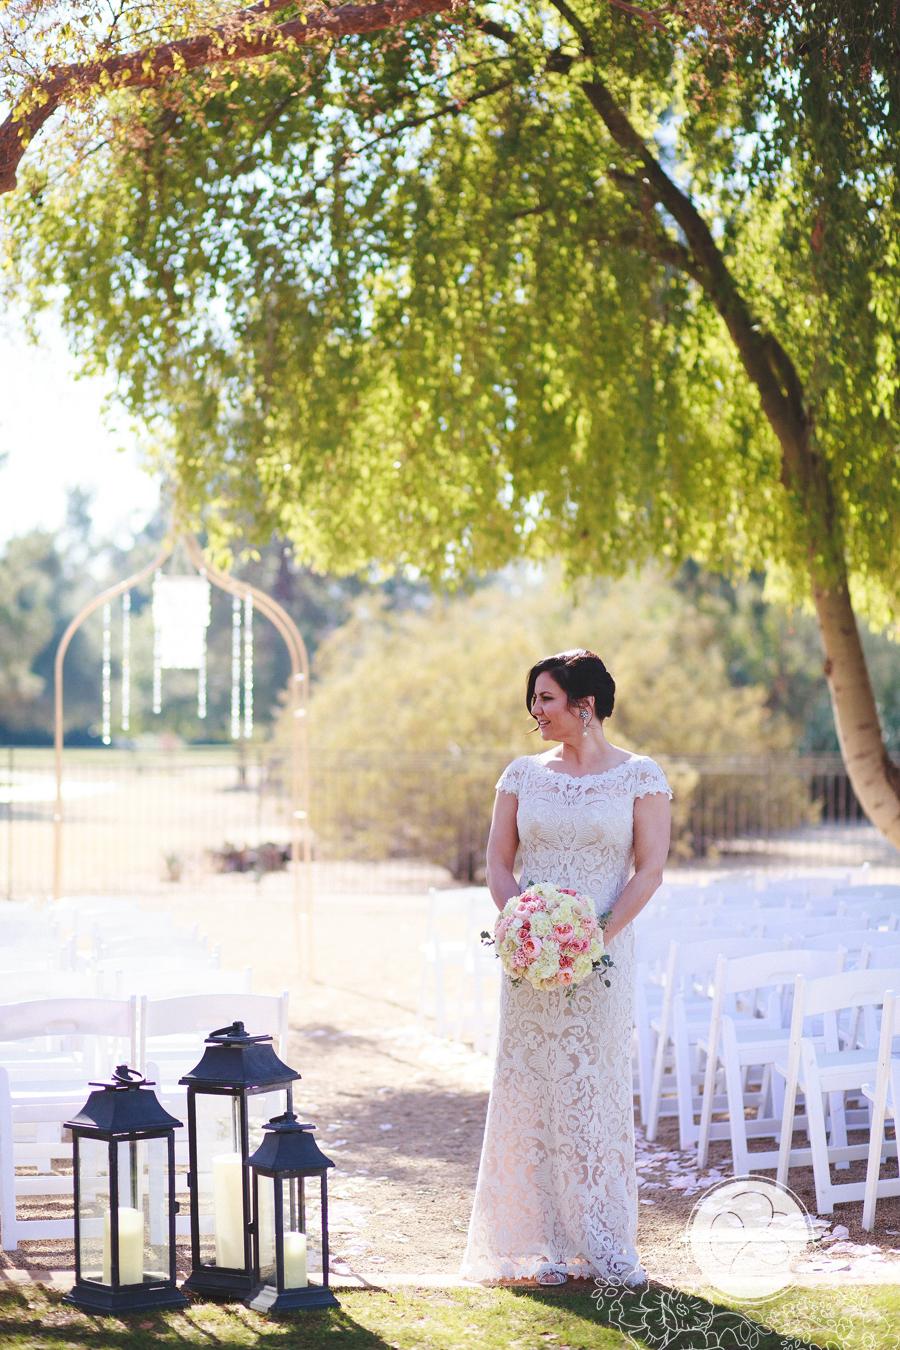 eyes2see_ed_sabina_backayrd_priveestate_wedding003